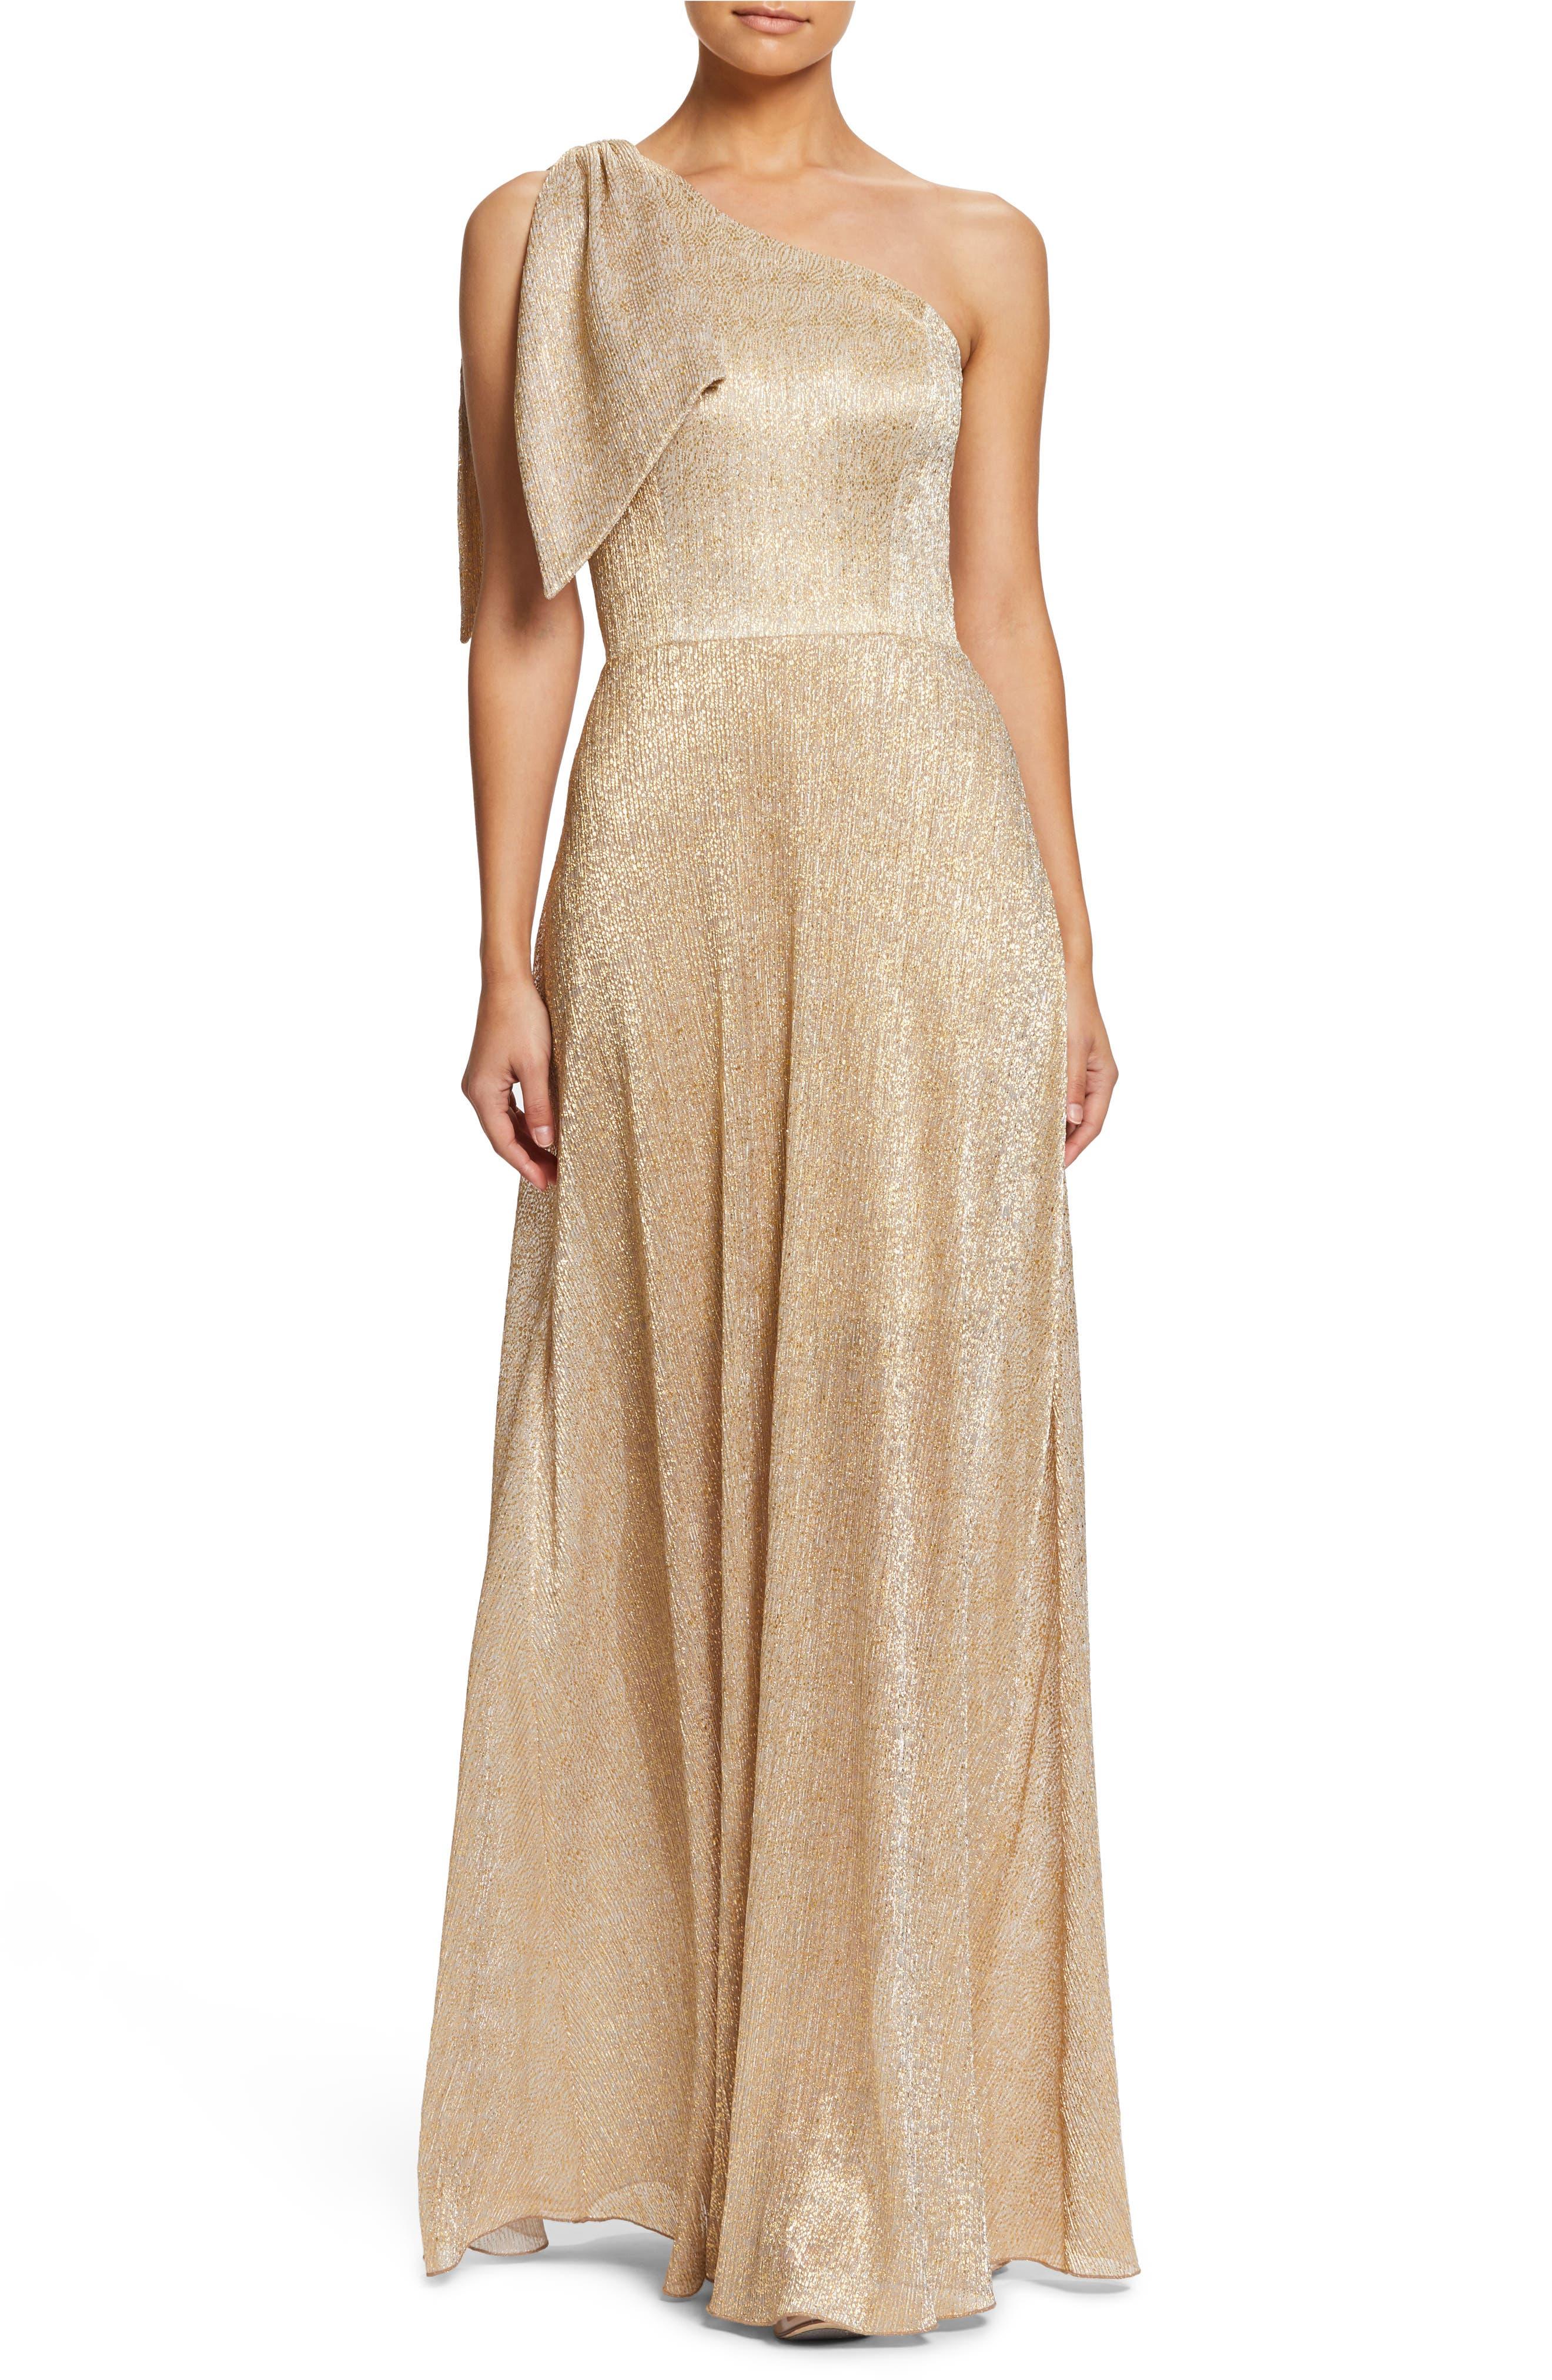 Savannah One-Shoulder Gown,                             Main thumbnail 1, color,                             GOLD